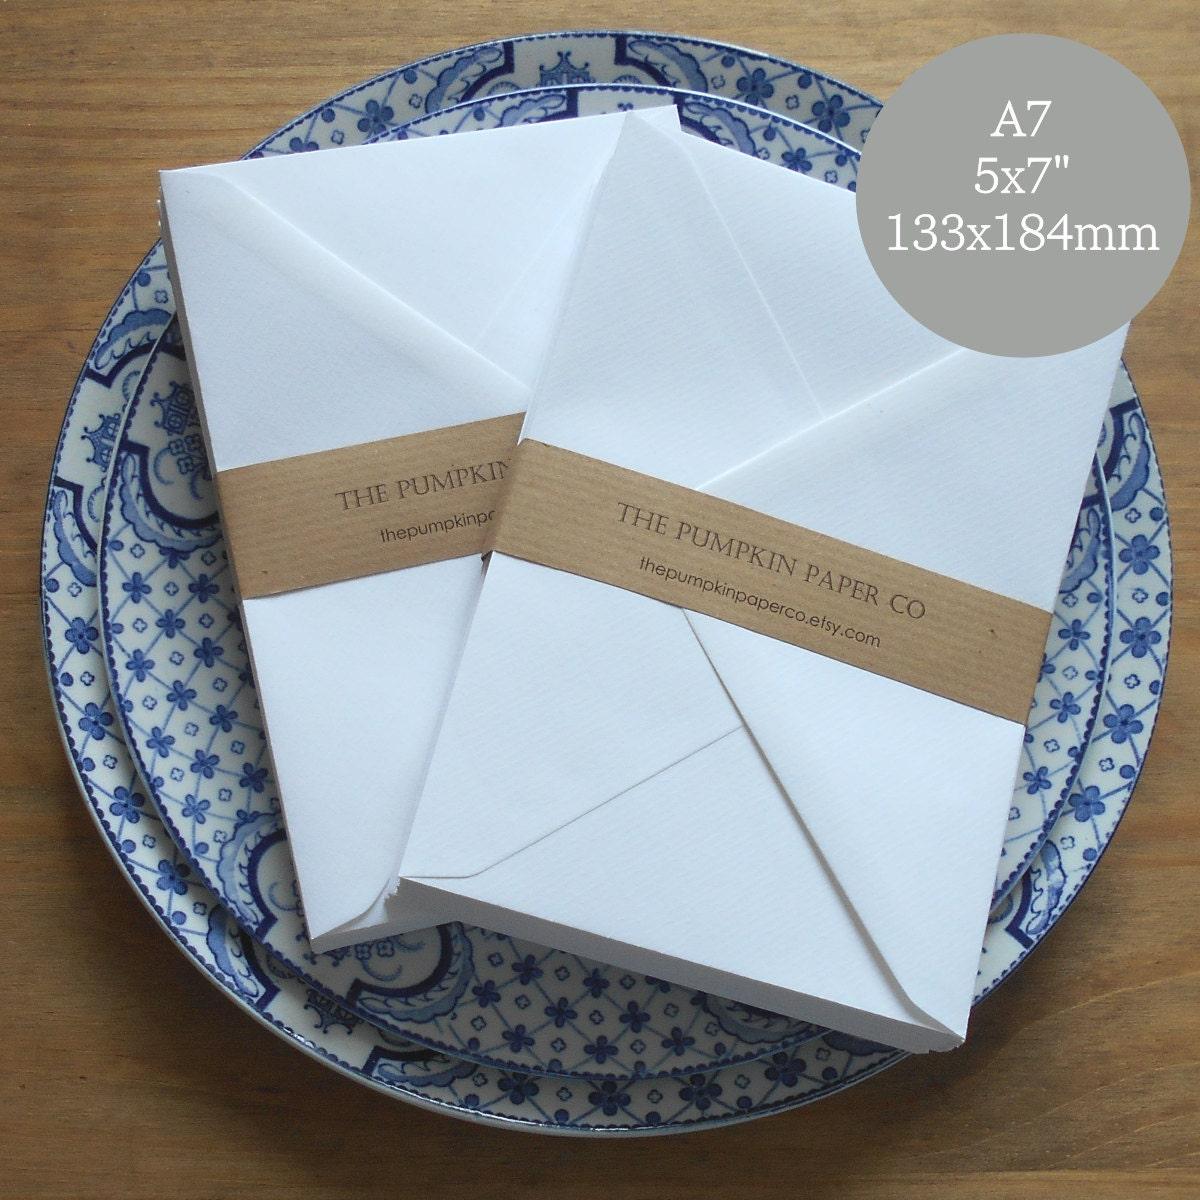 25 5x7 wedding envelopes a7 envelopes white for invitations